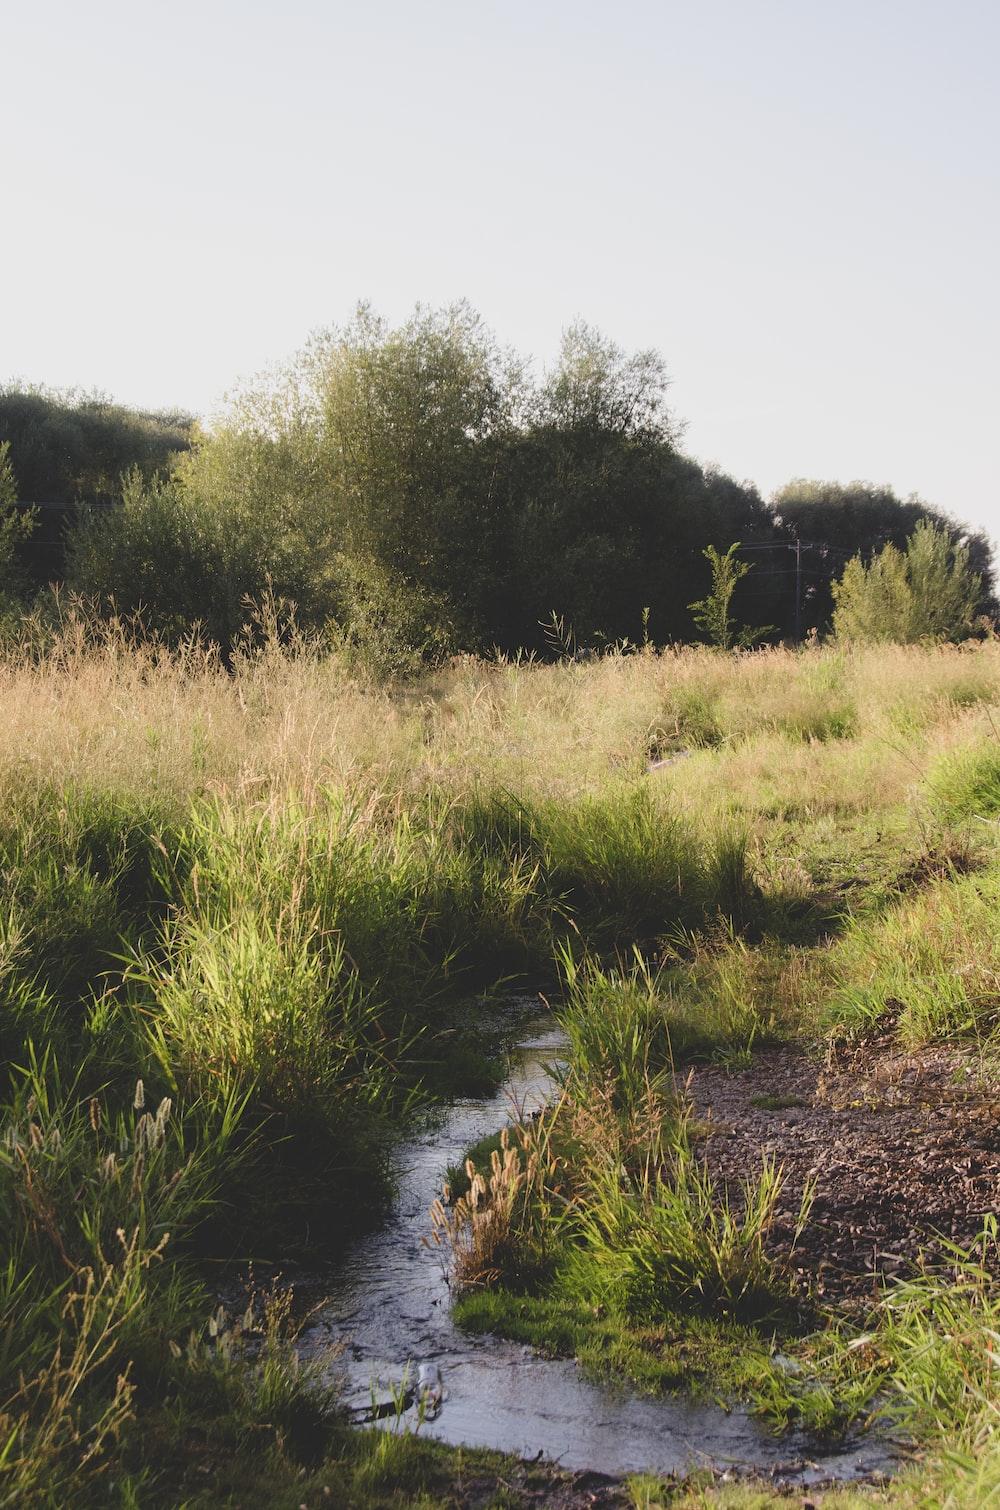 green grass field near river during daytime